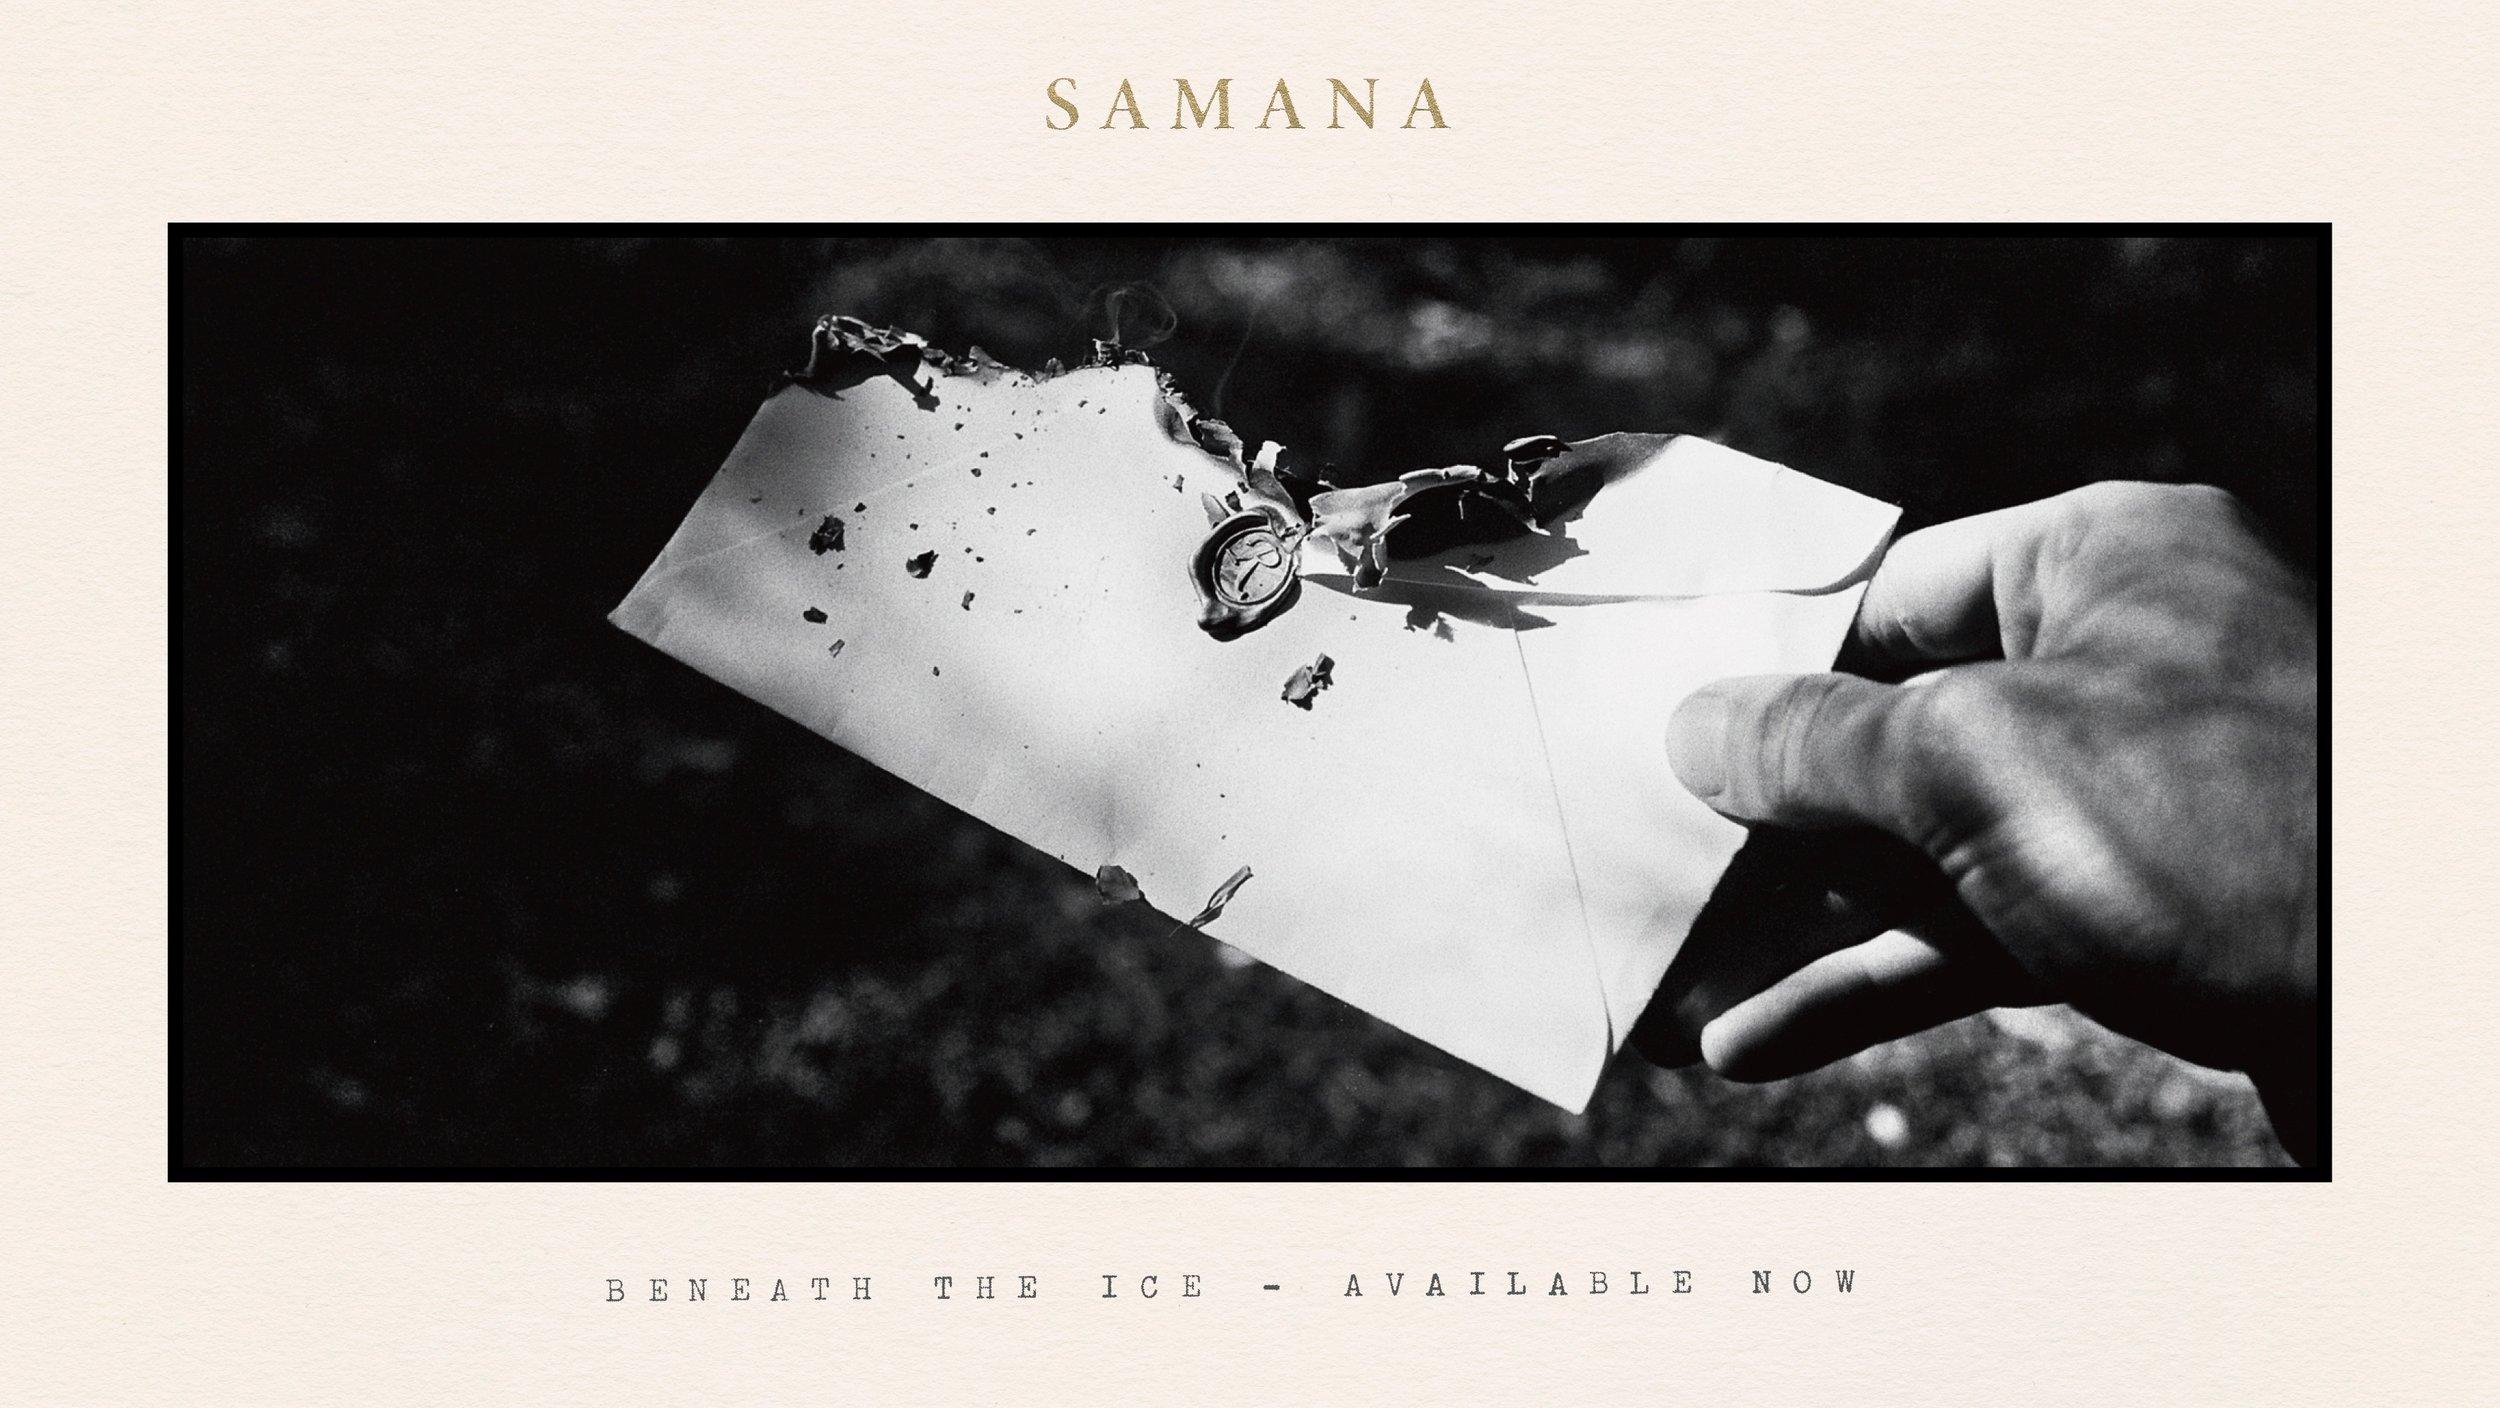 Beneath The Ice - Samana